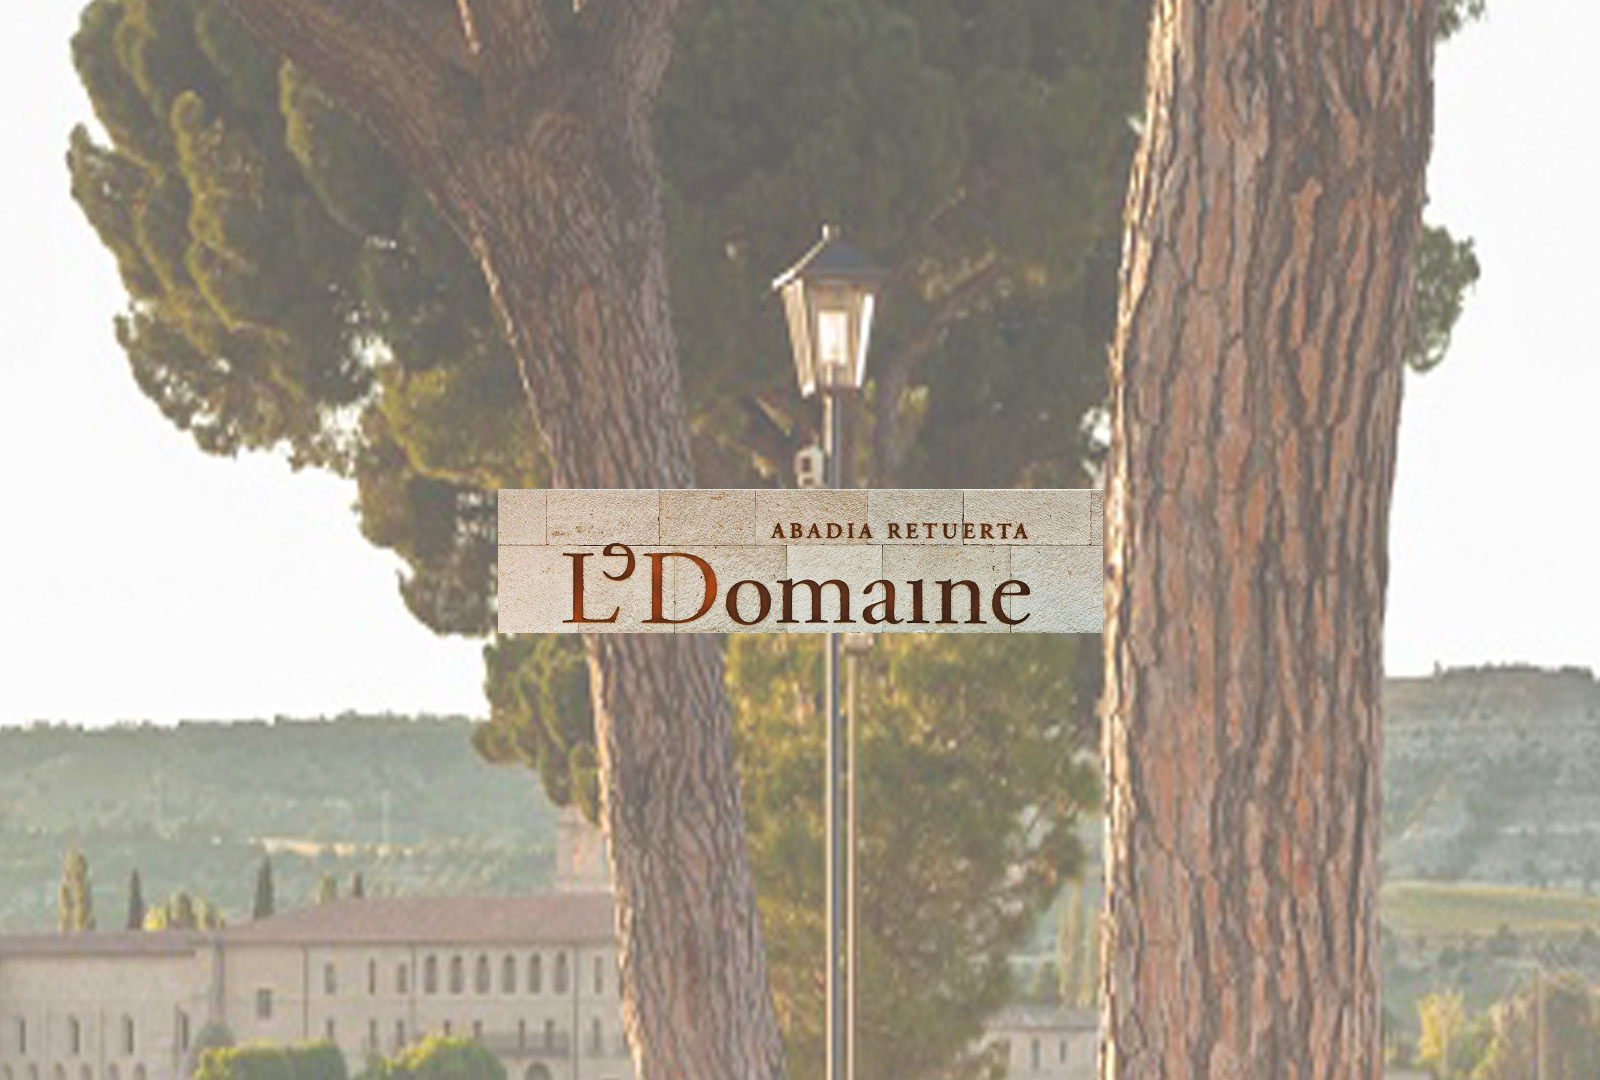 Abadía Retuerta Ledomaine mejor hotel de España.